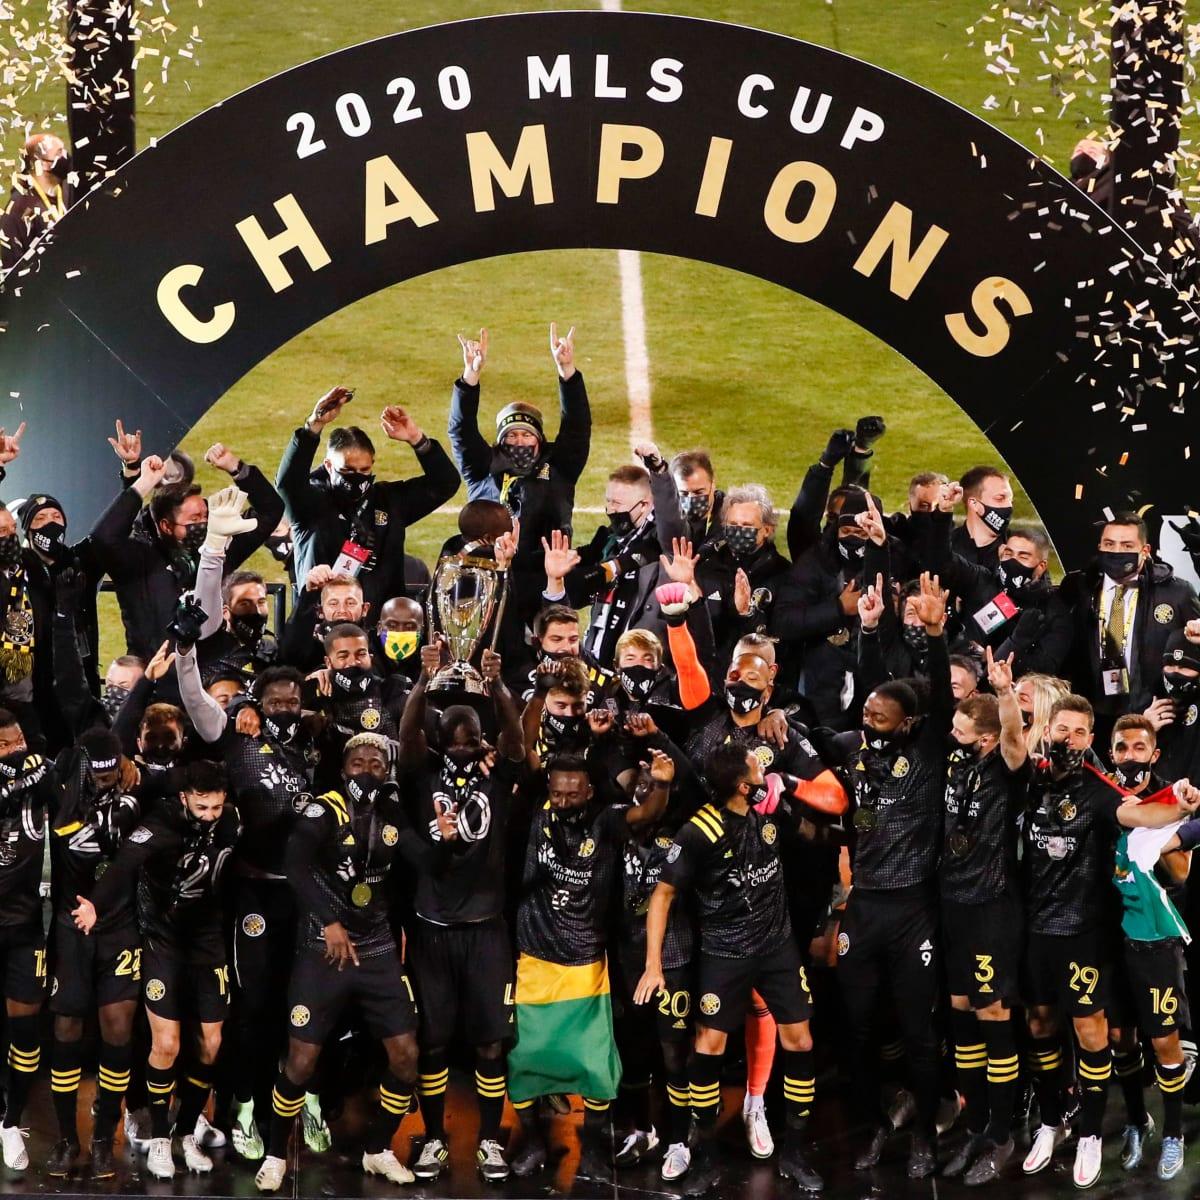 Columbus Crew MLS Champions 2020